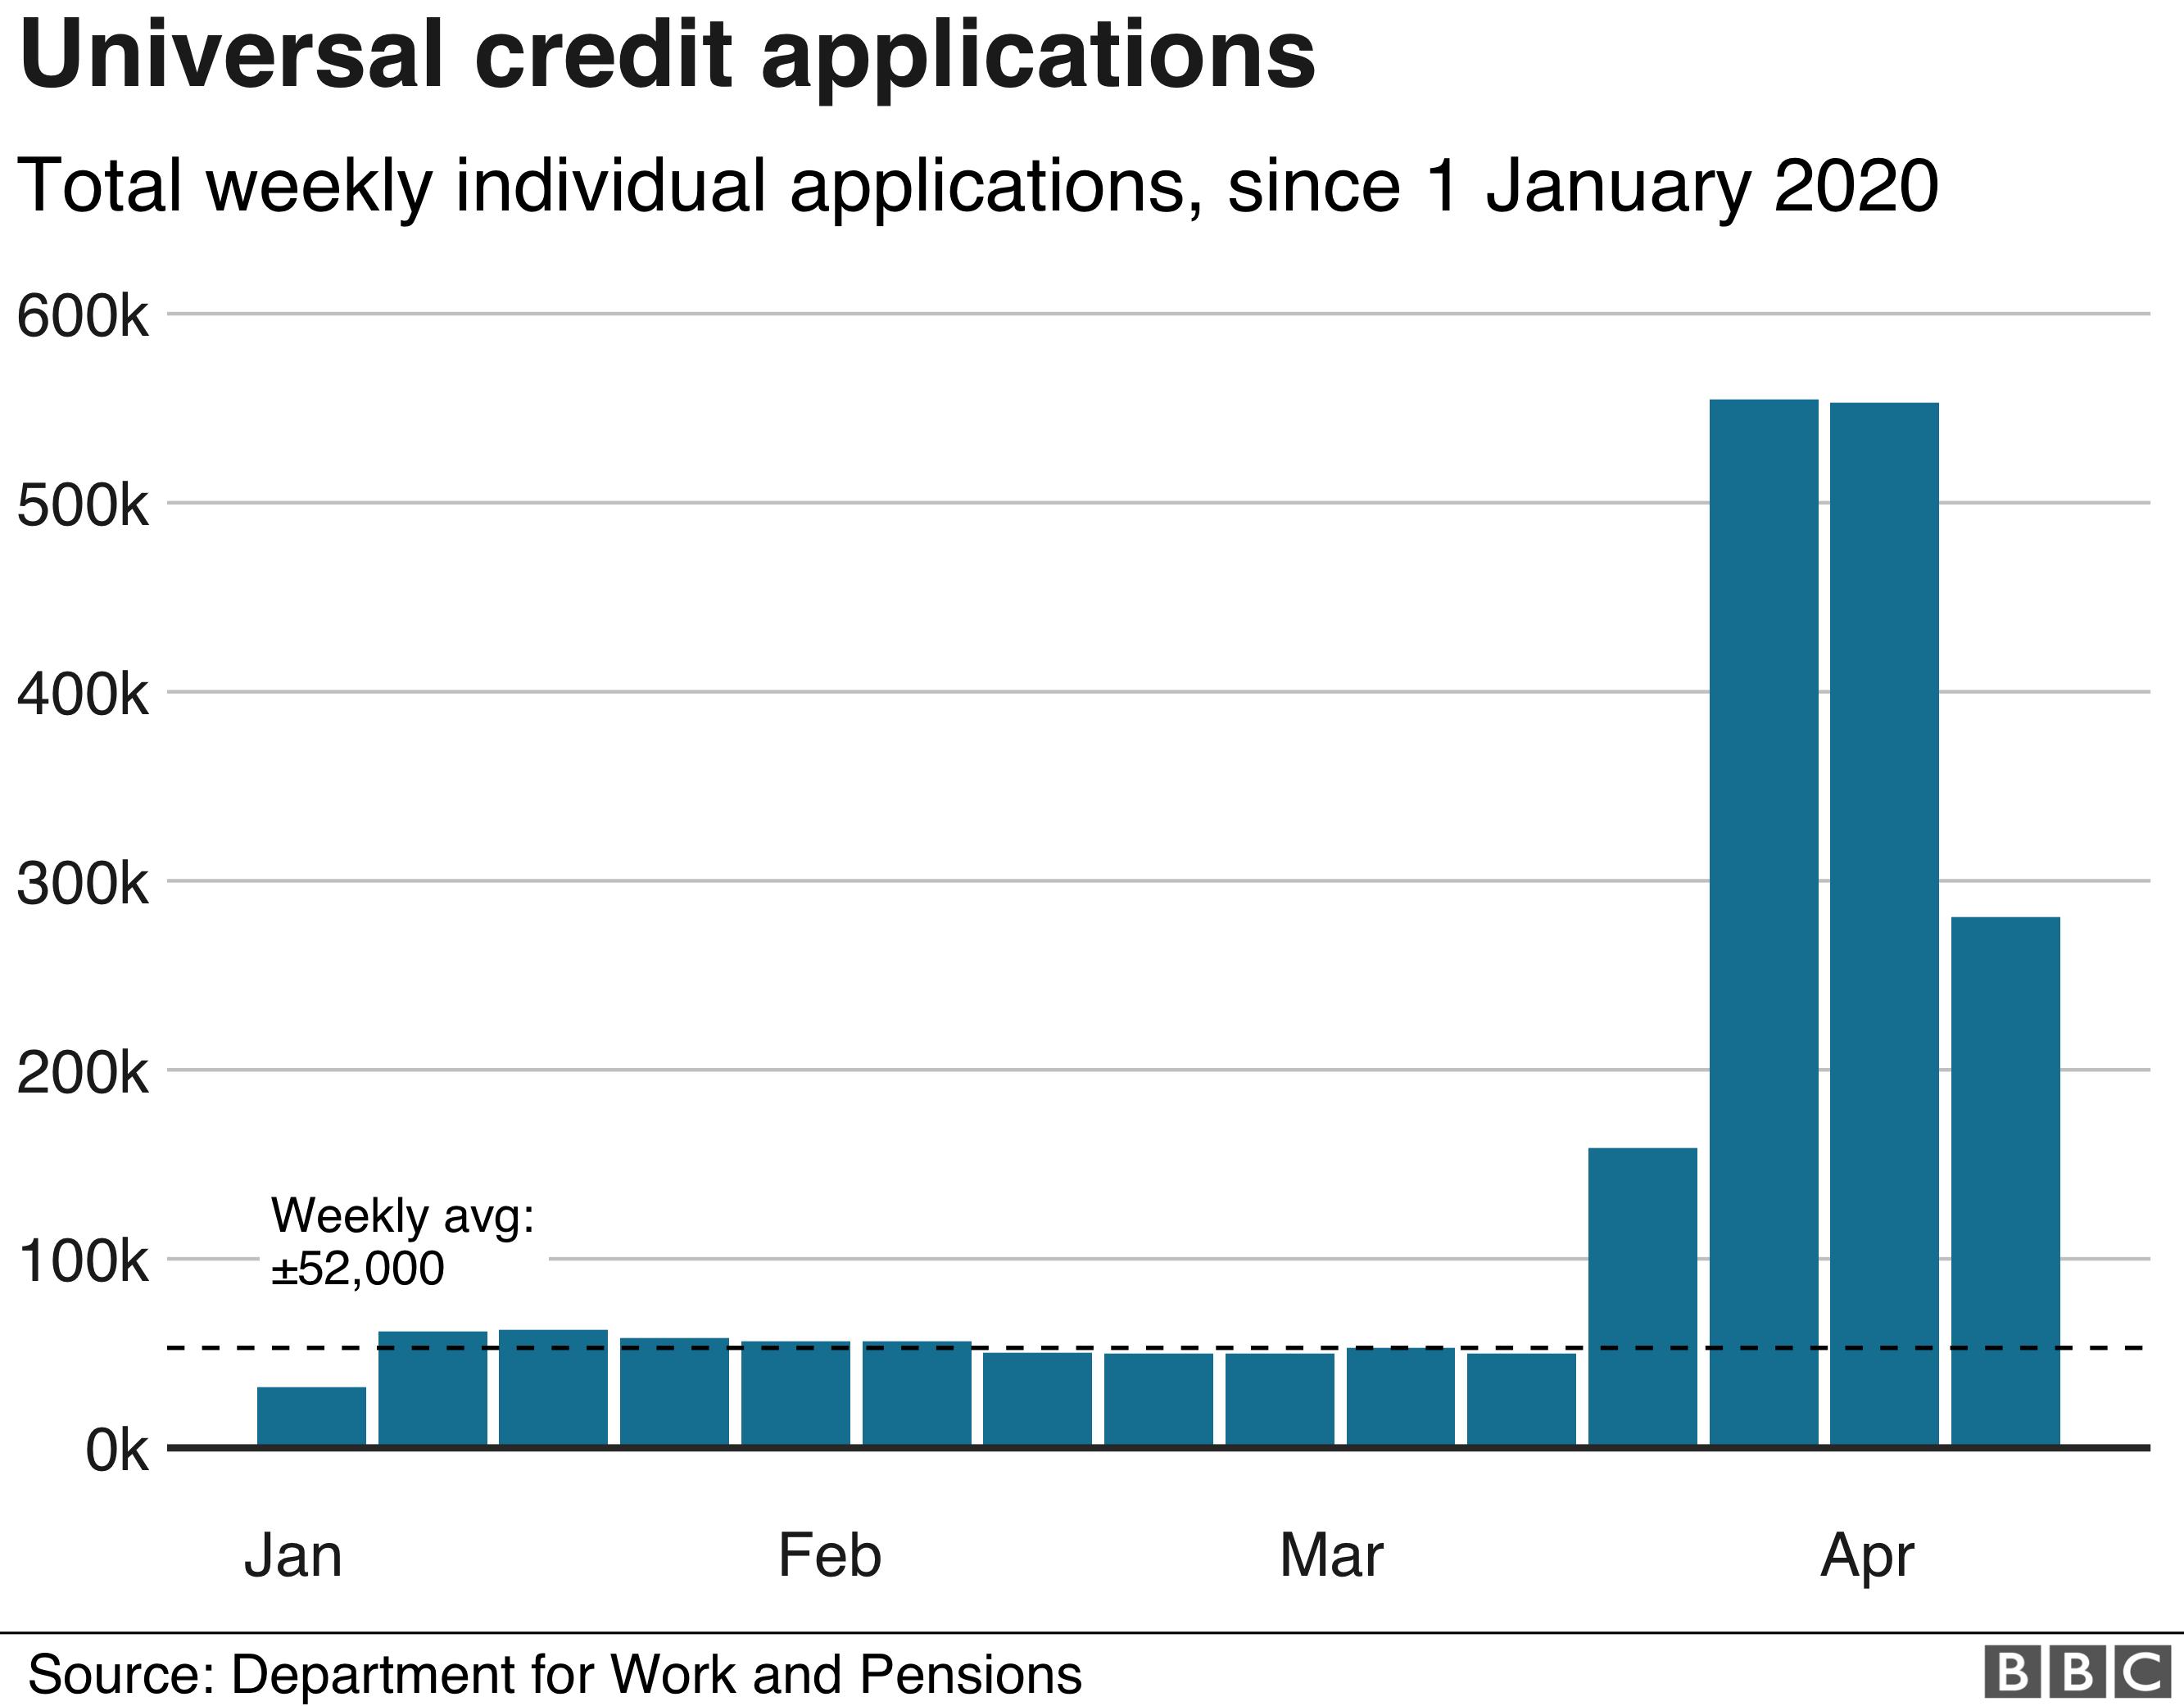 Universal credit applicants